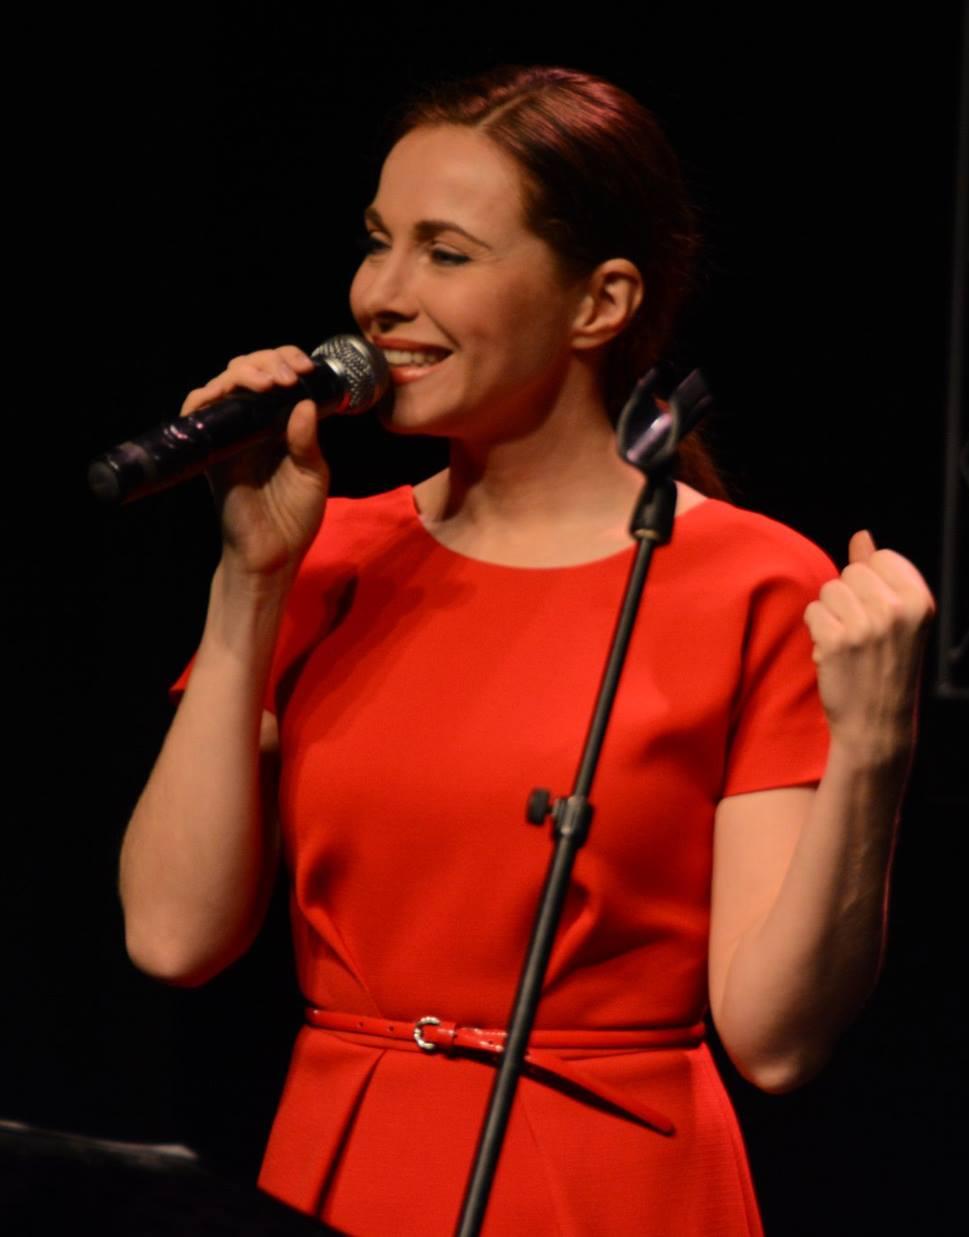 Актриса екатерина гусева биография личная жизнь thumbnail